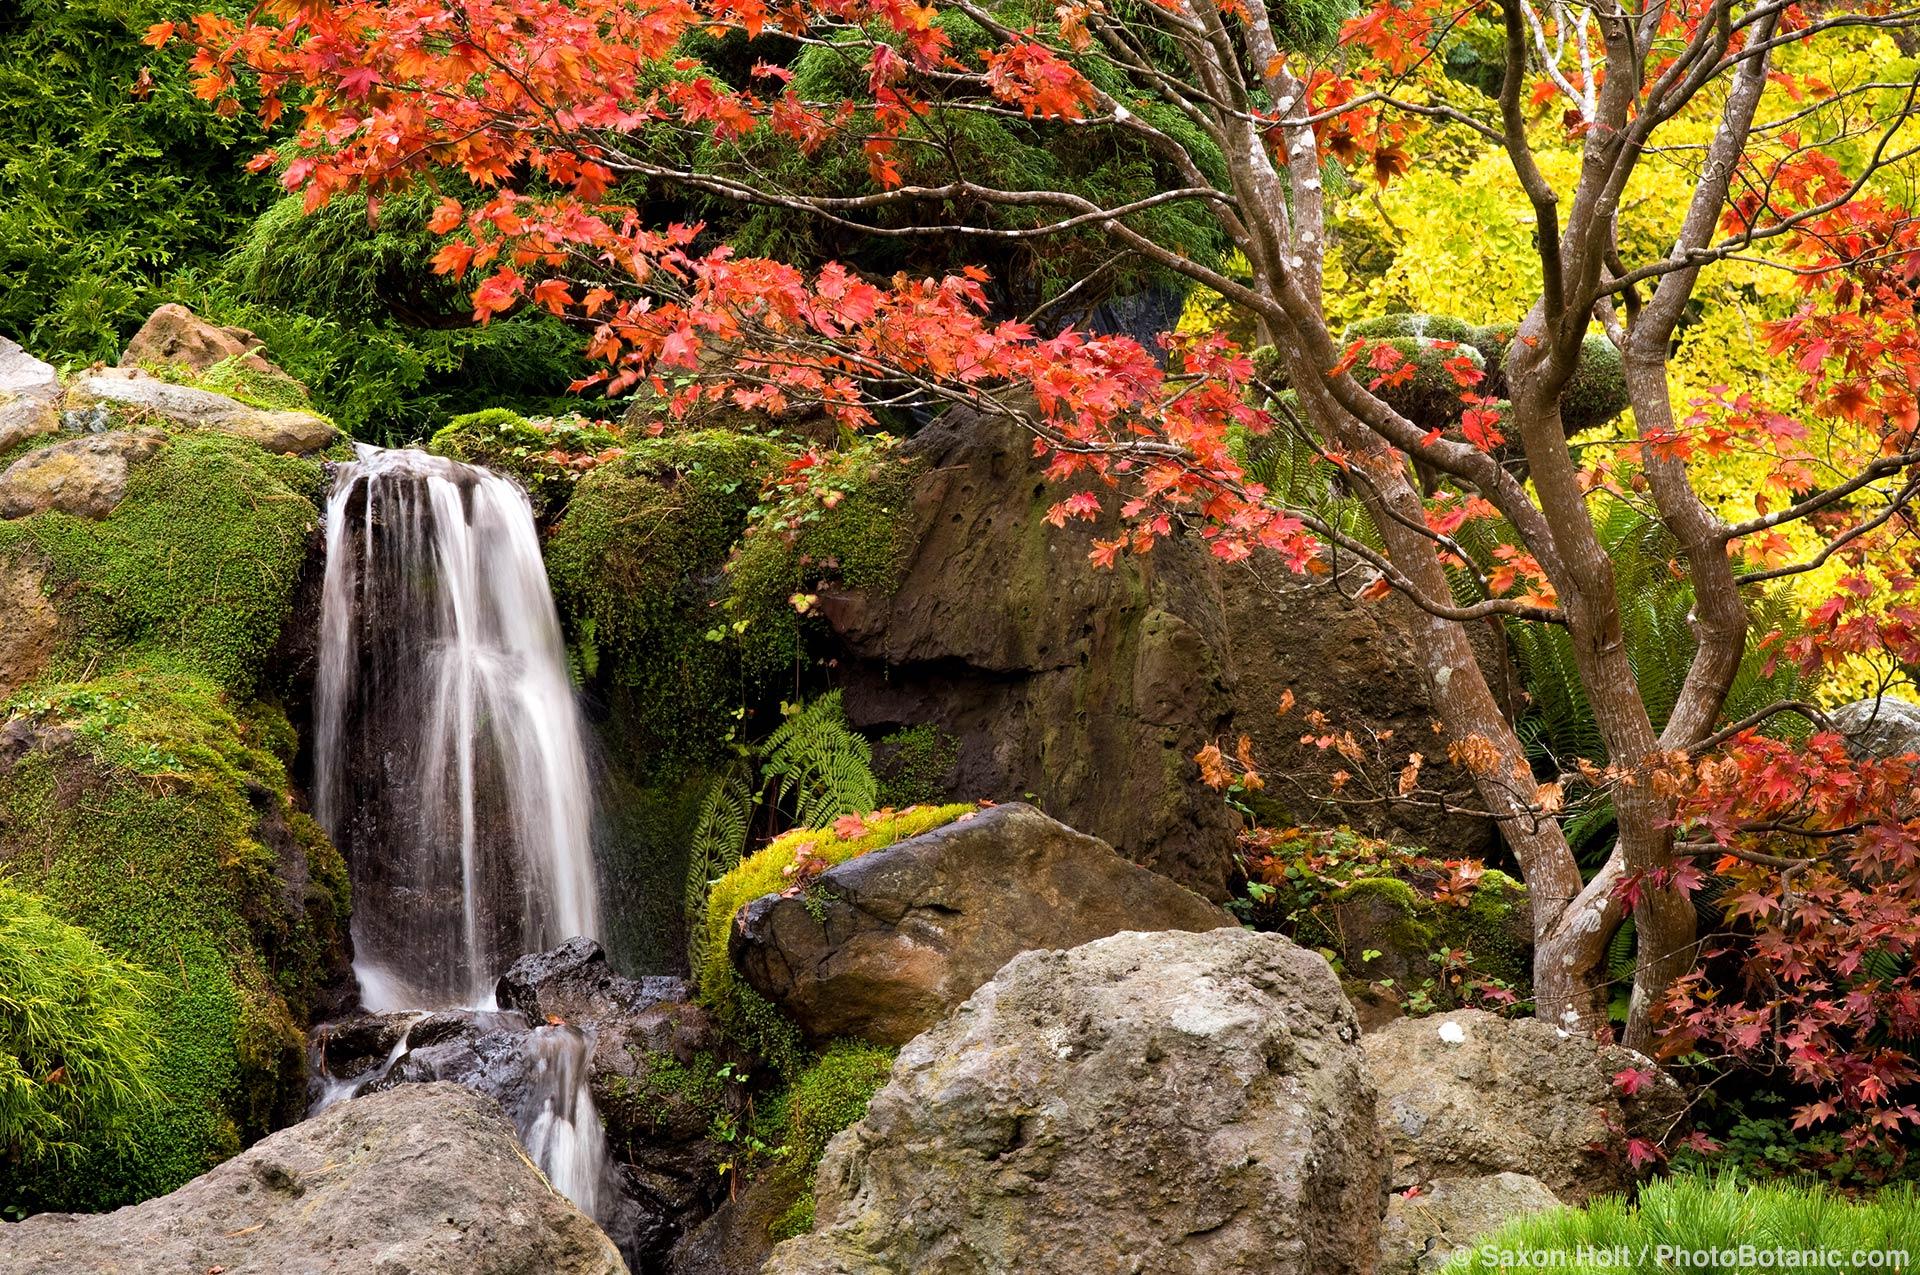 Japanese Tea Garden in Golden Gate Park, San Francisco, autumn